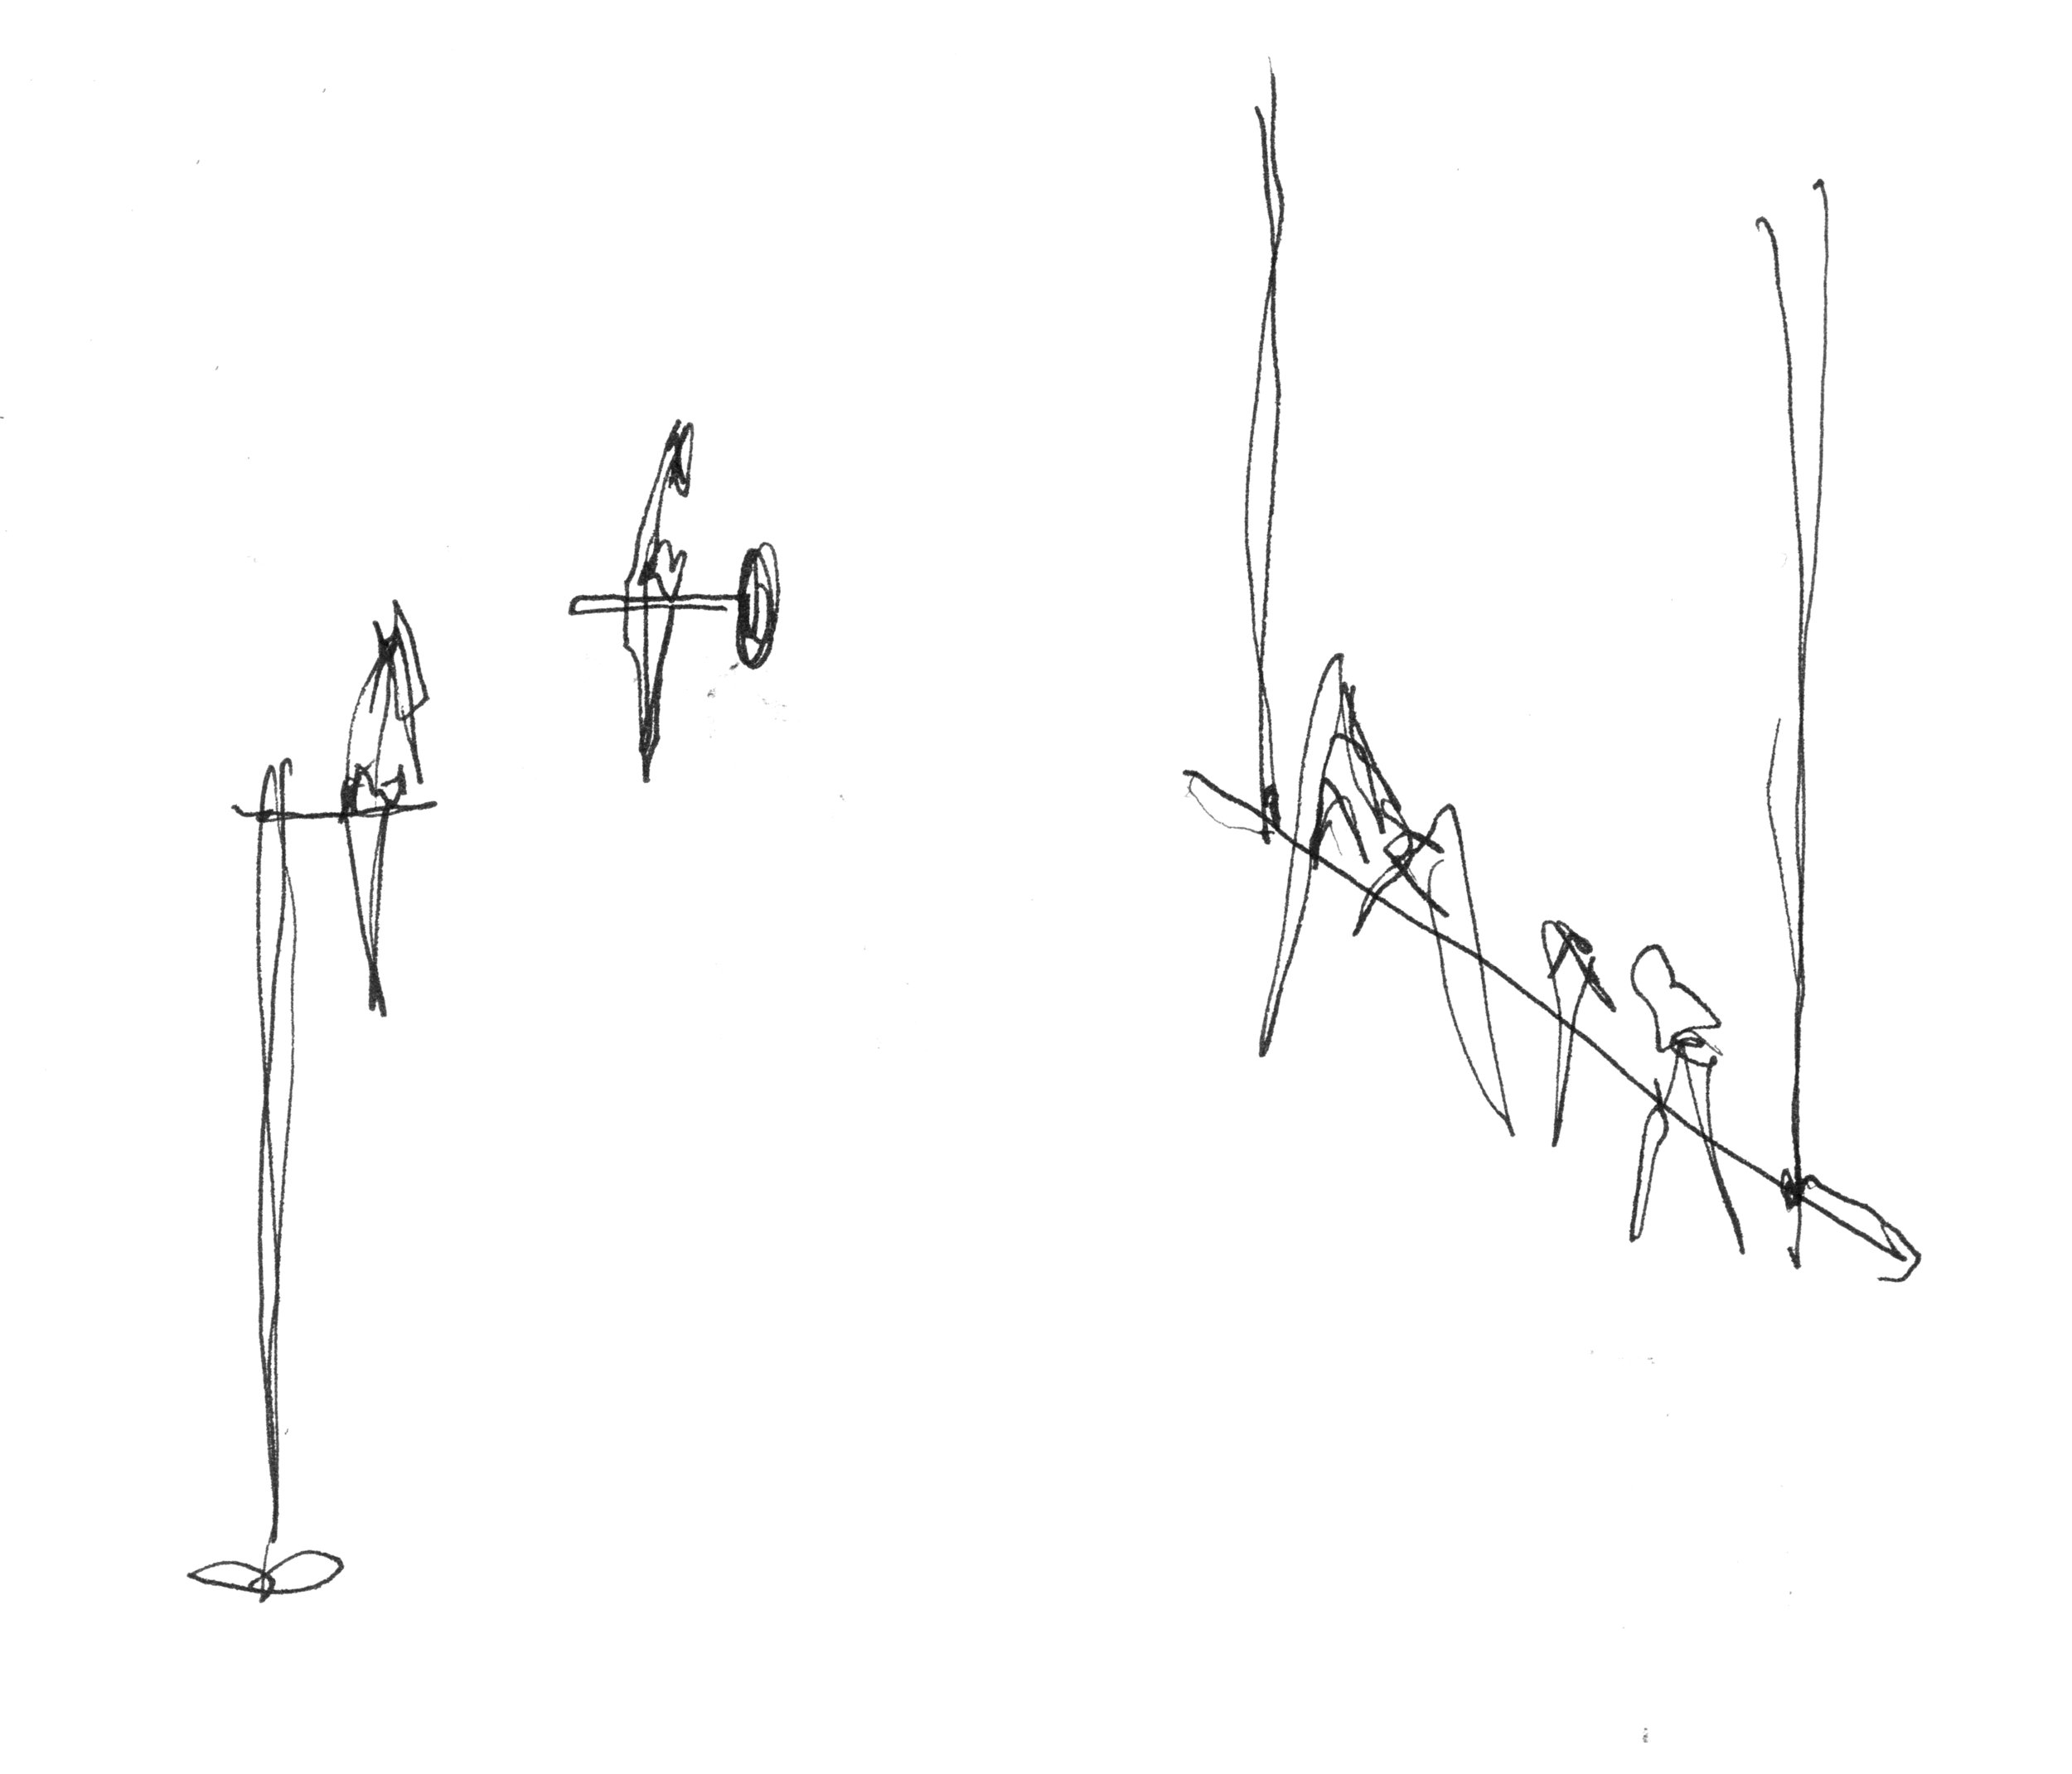 perchlight_sketch1.jpg